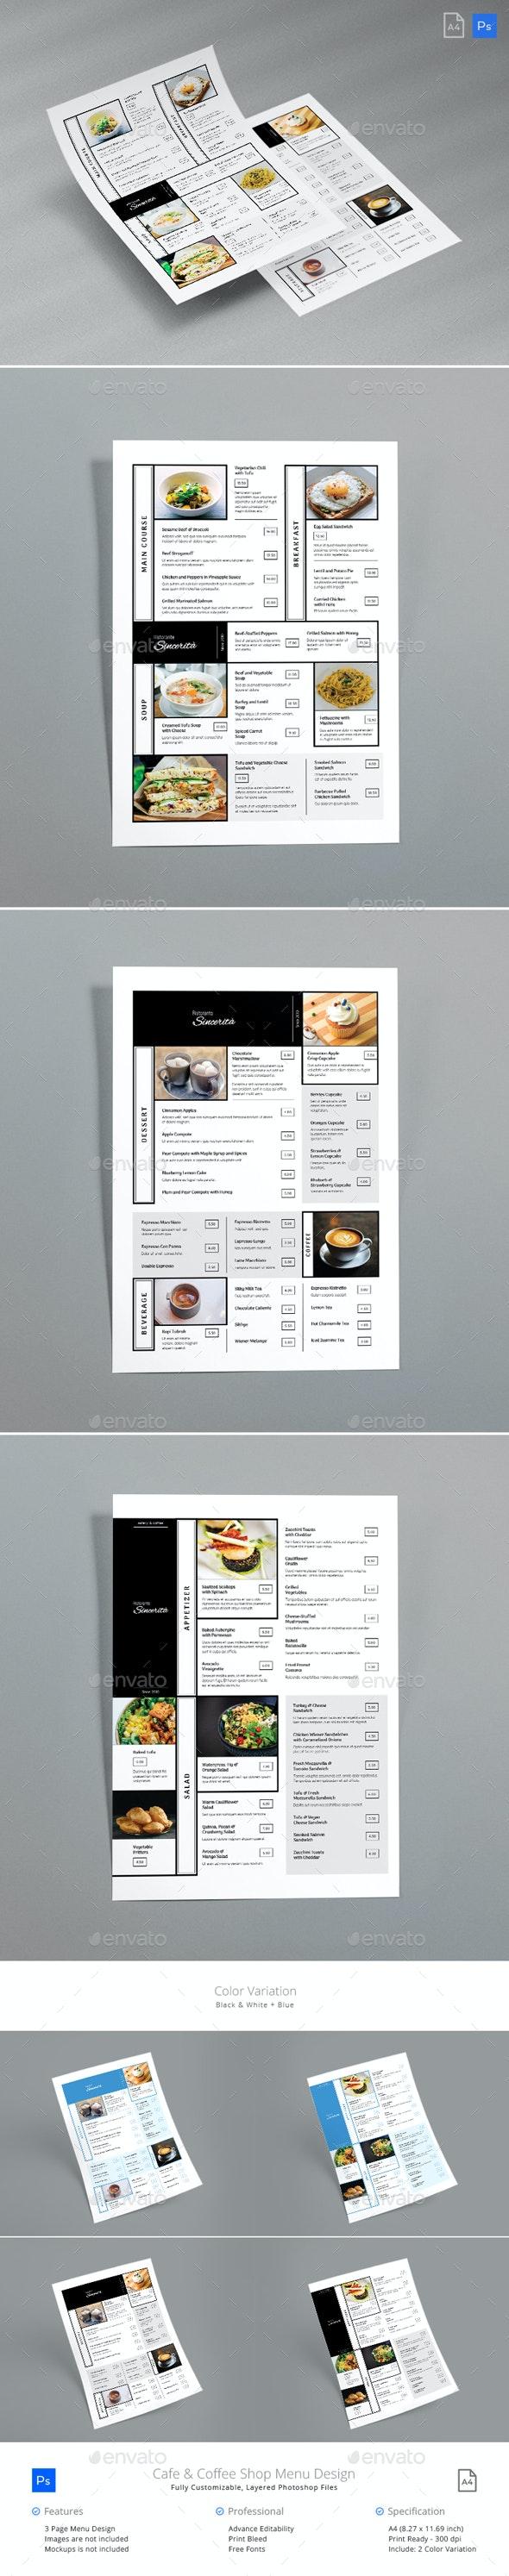 Square Line Cafe Menu - Food Menus Print Templates